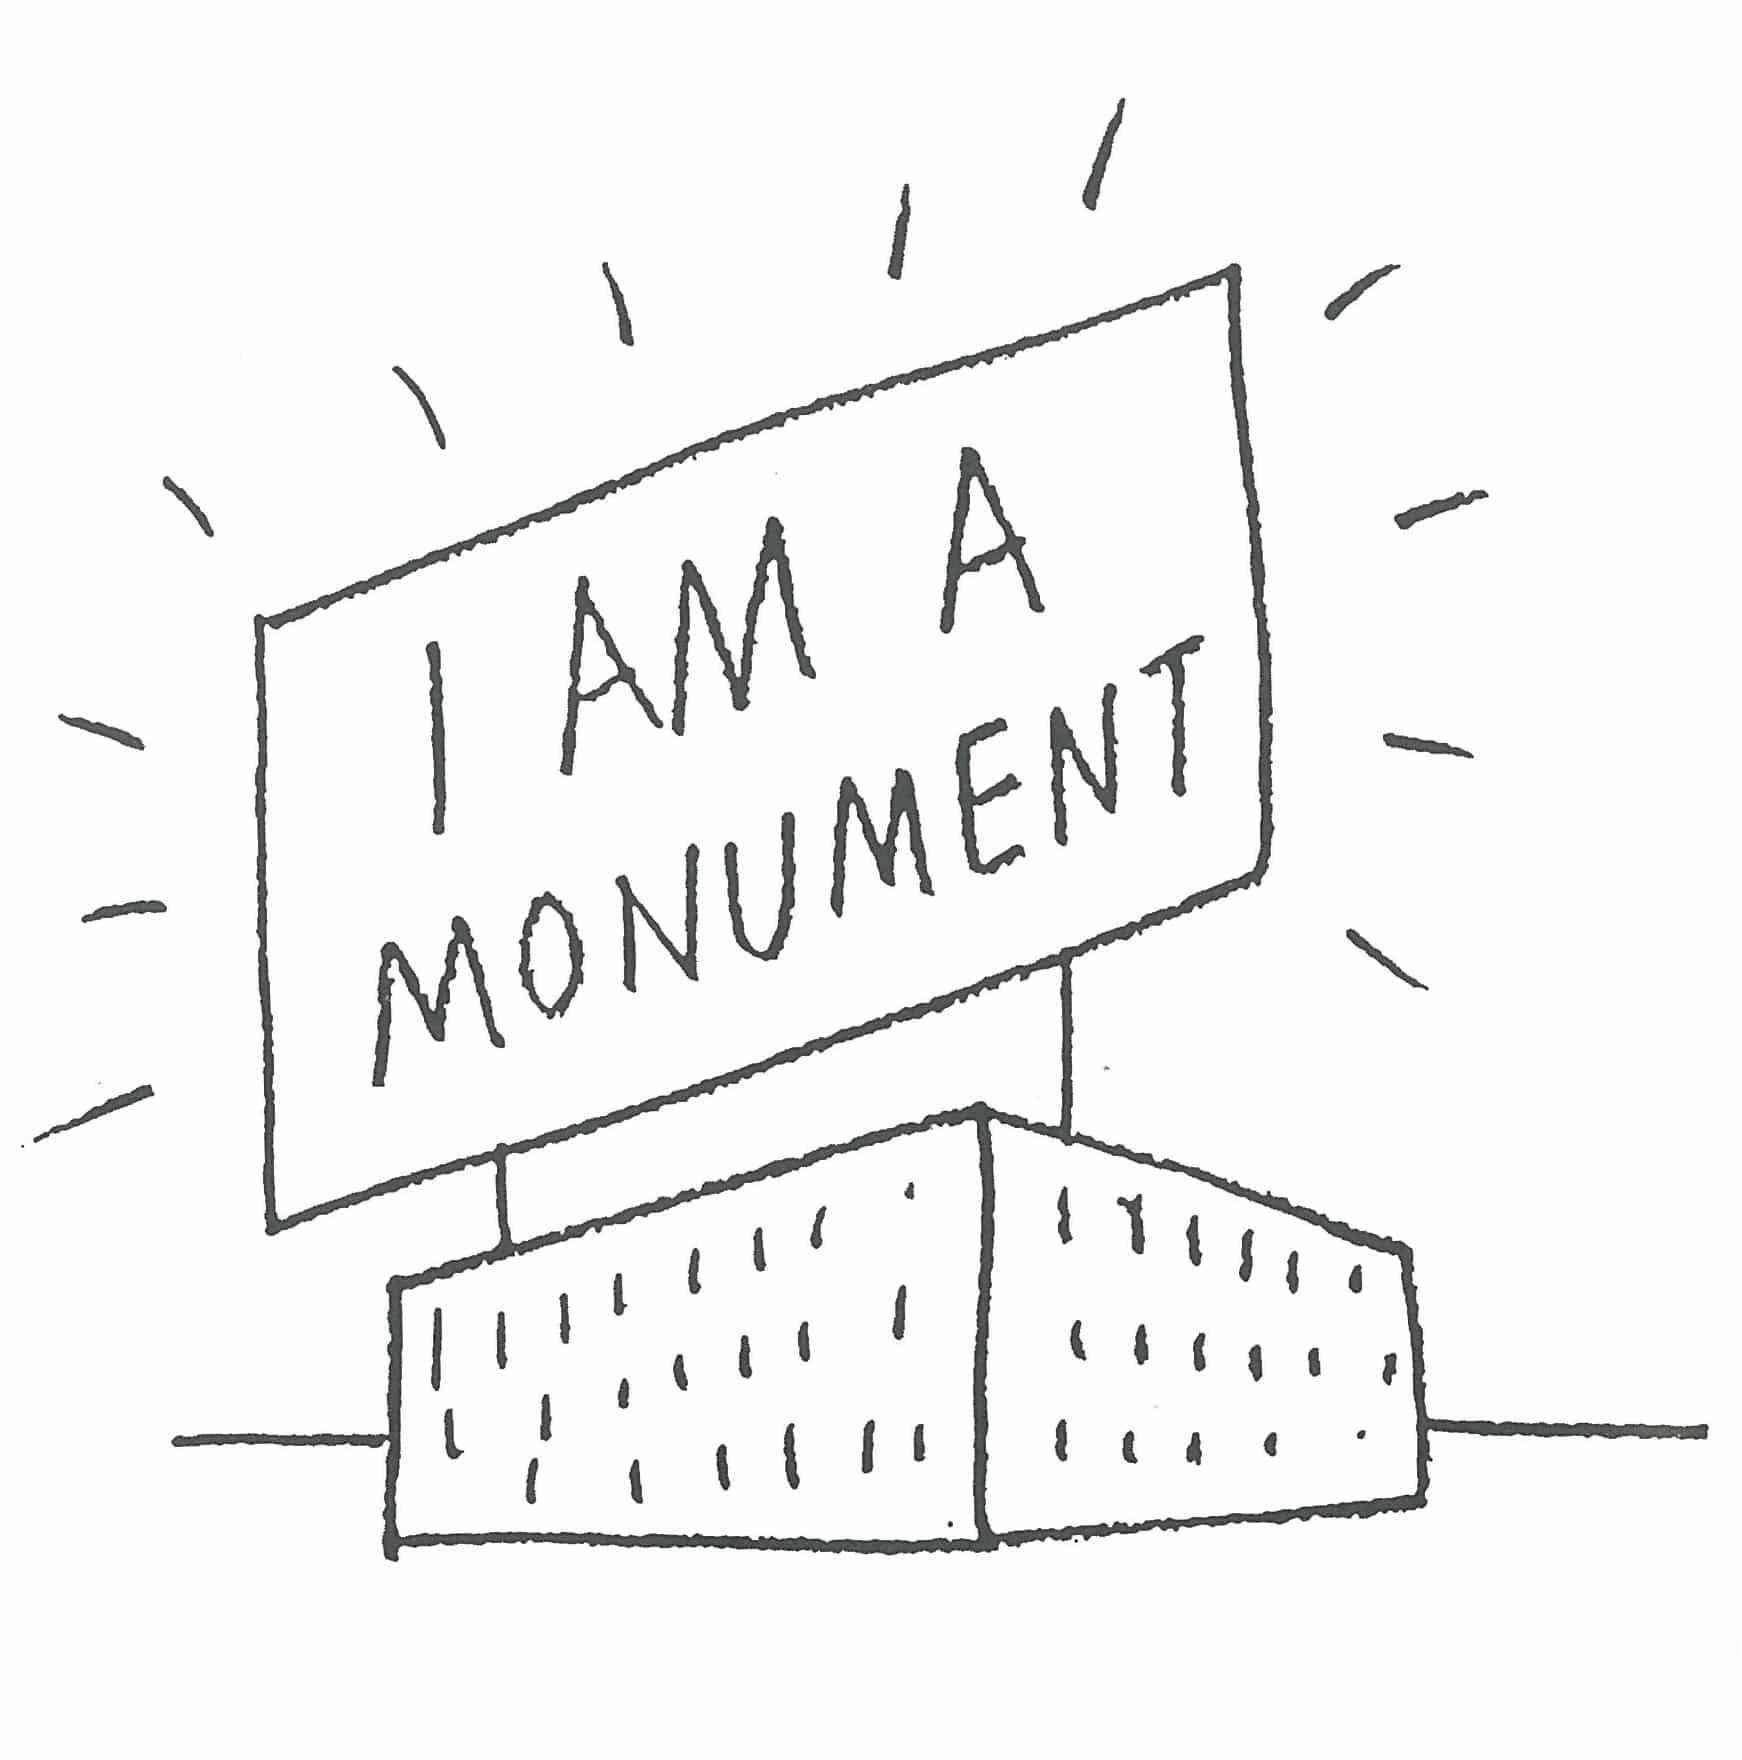 Venturi i am a monument